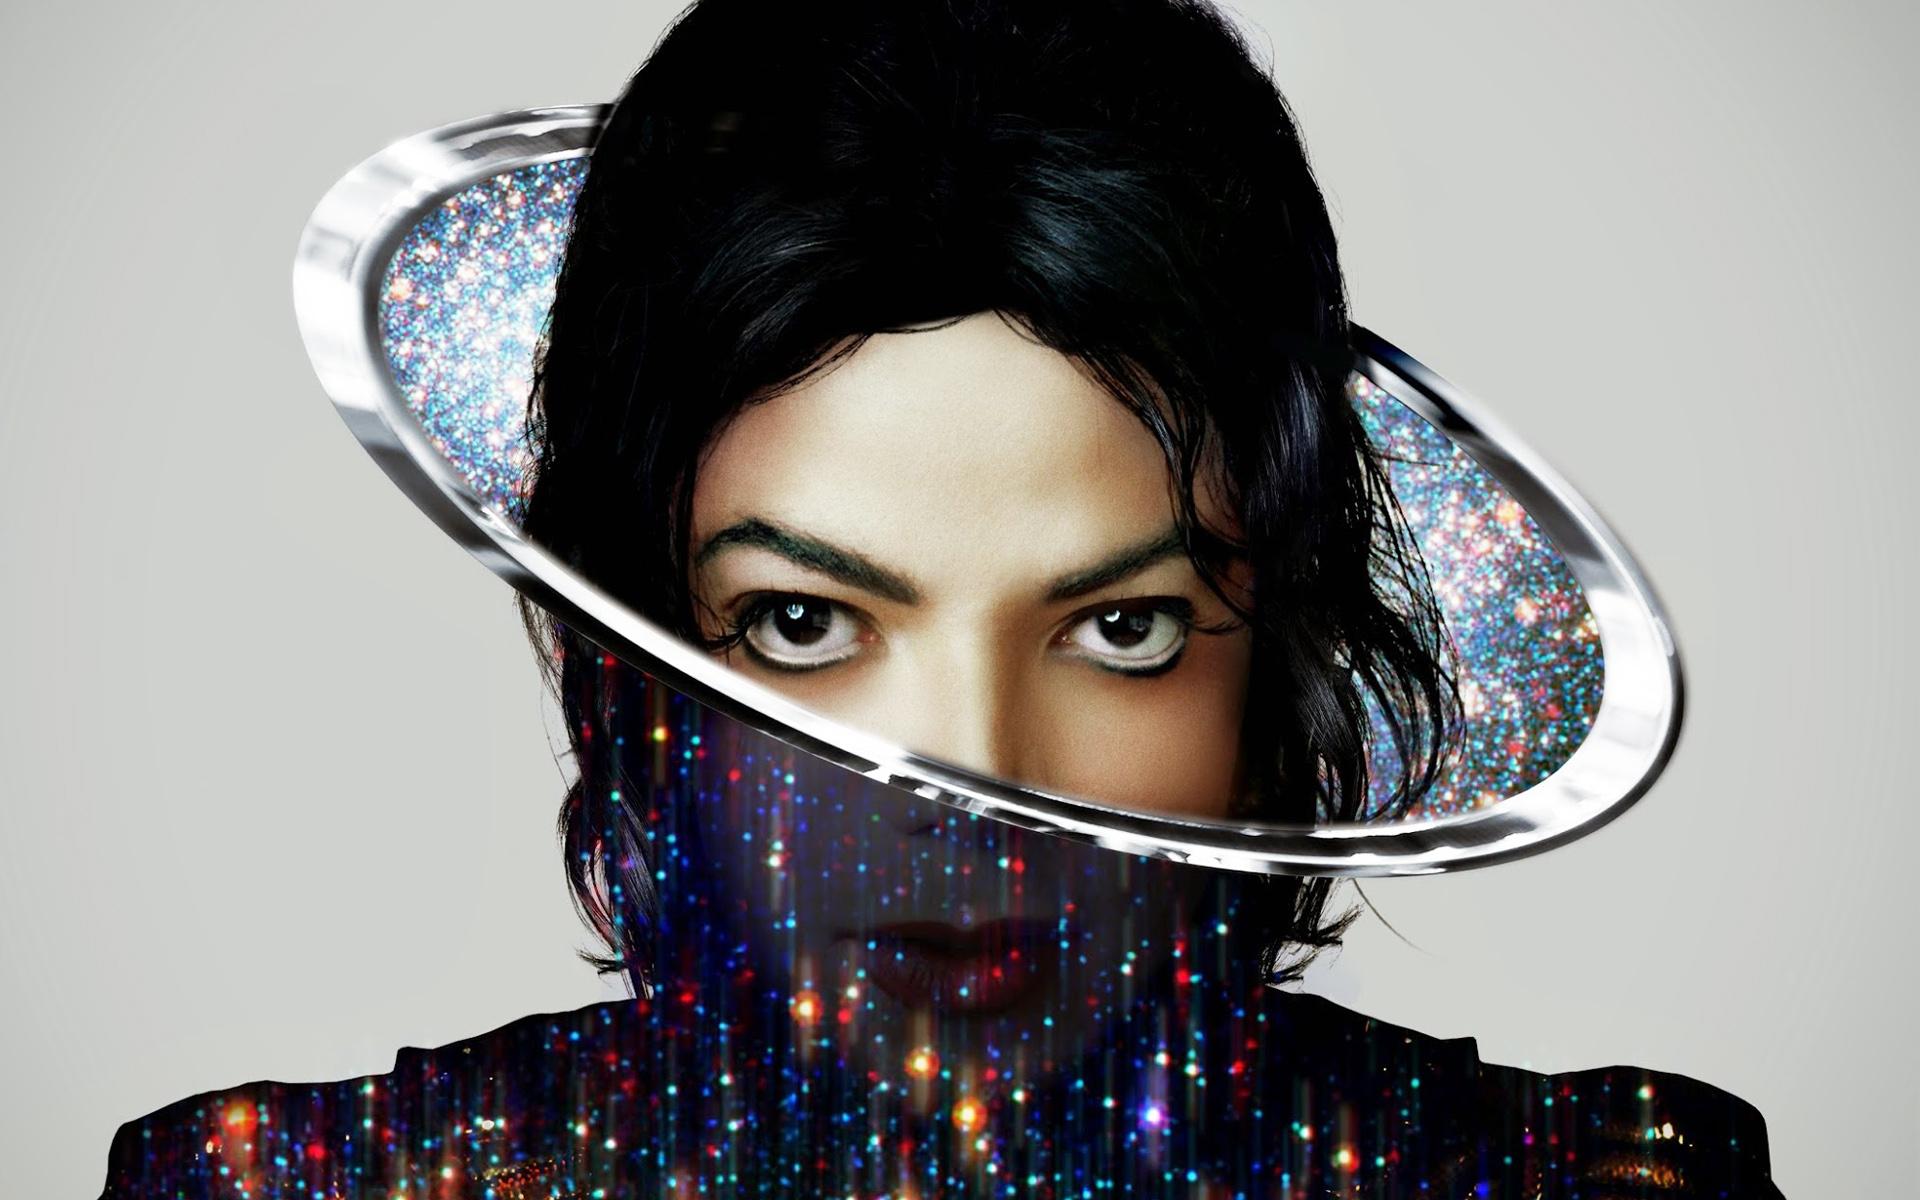 Fall Out Boy Desktop Wallpaper Hd Free Hd Michael Jackson Wallpapers Pixelstalk Net